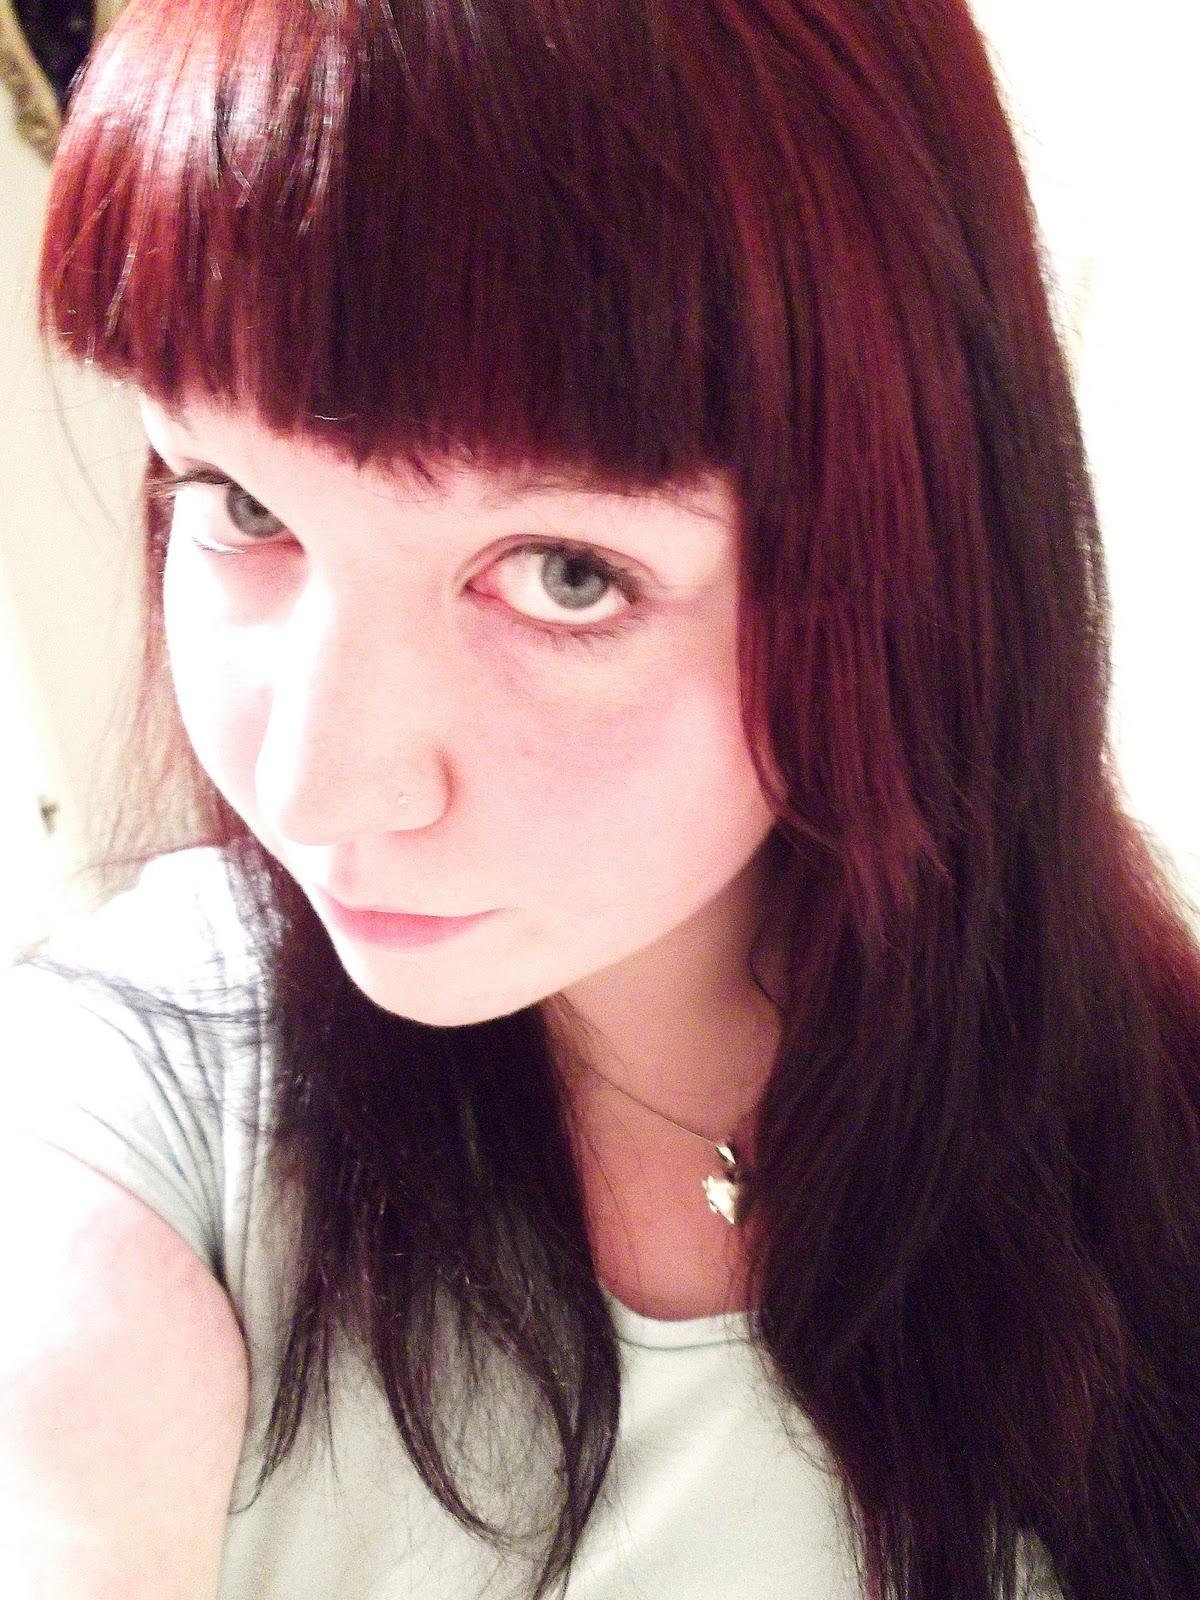 Cherry Coke Brown Hair Color Sallys Dark Brown Hairs Photo | Dark ...